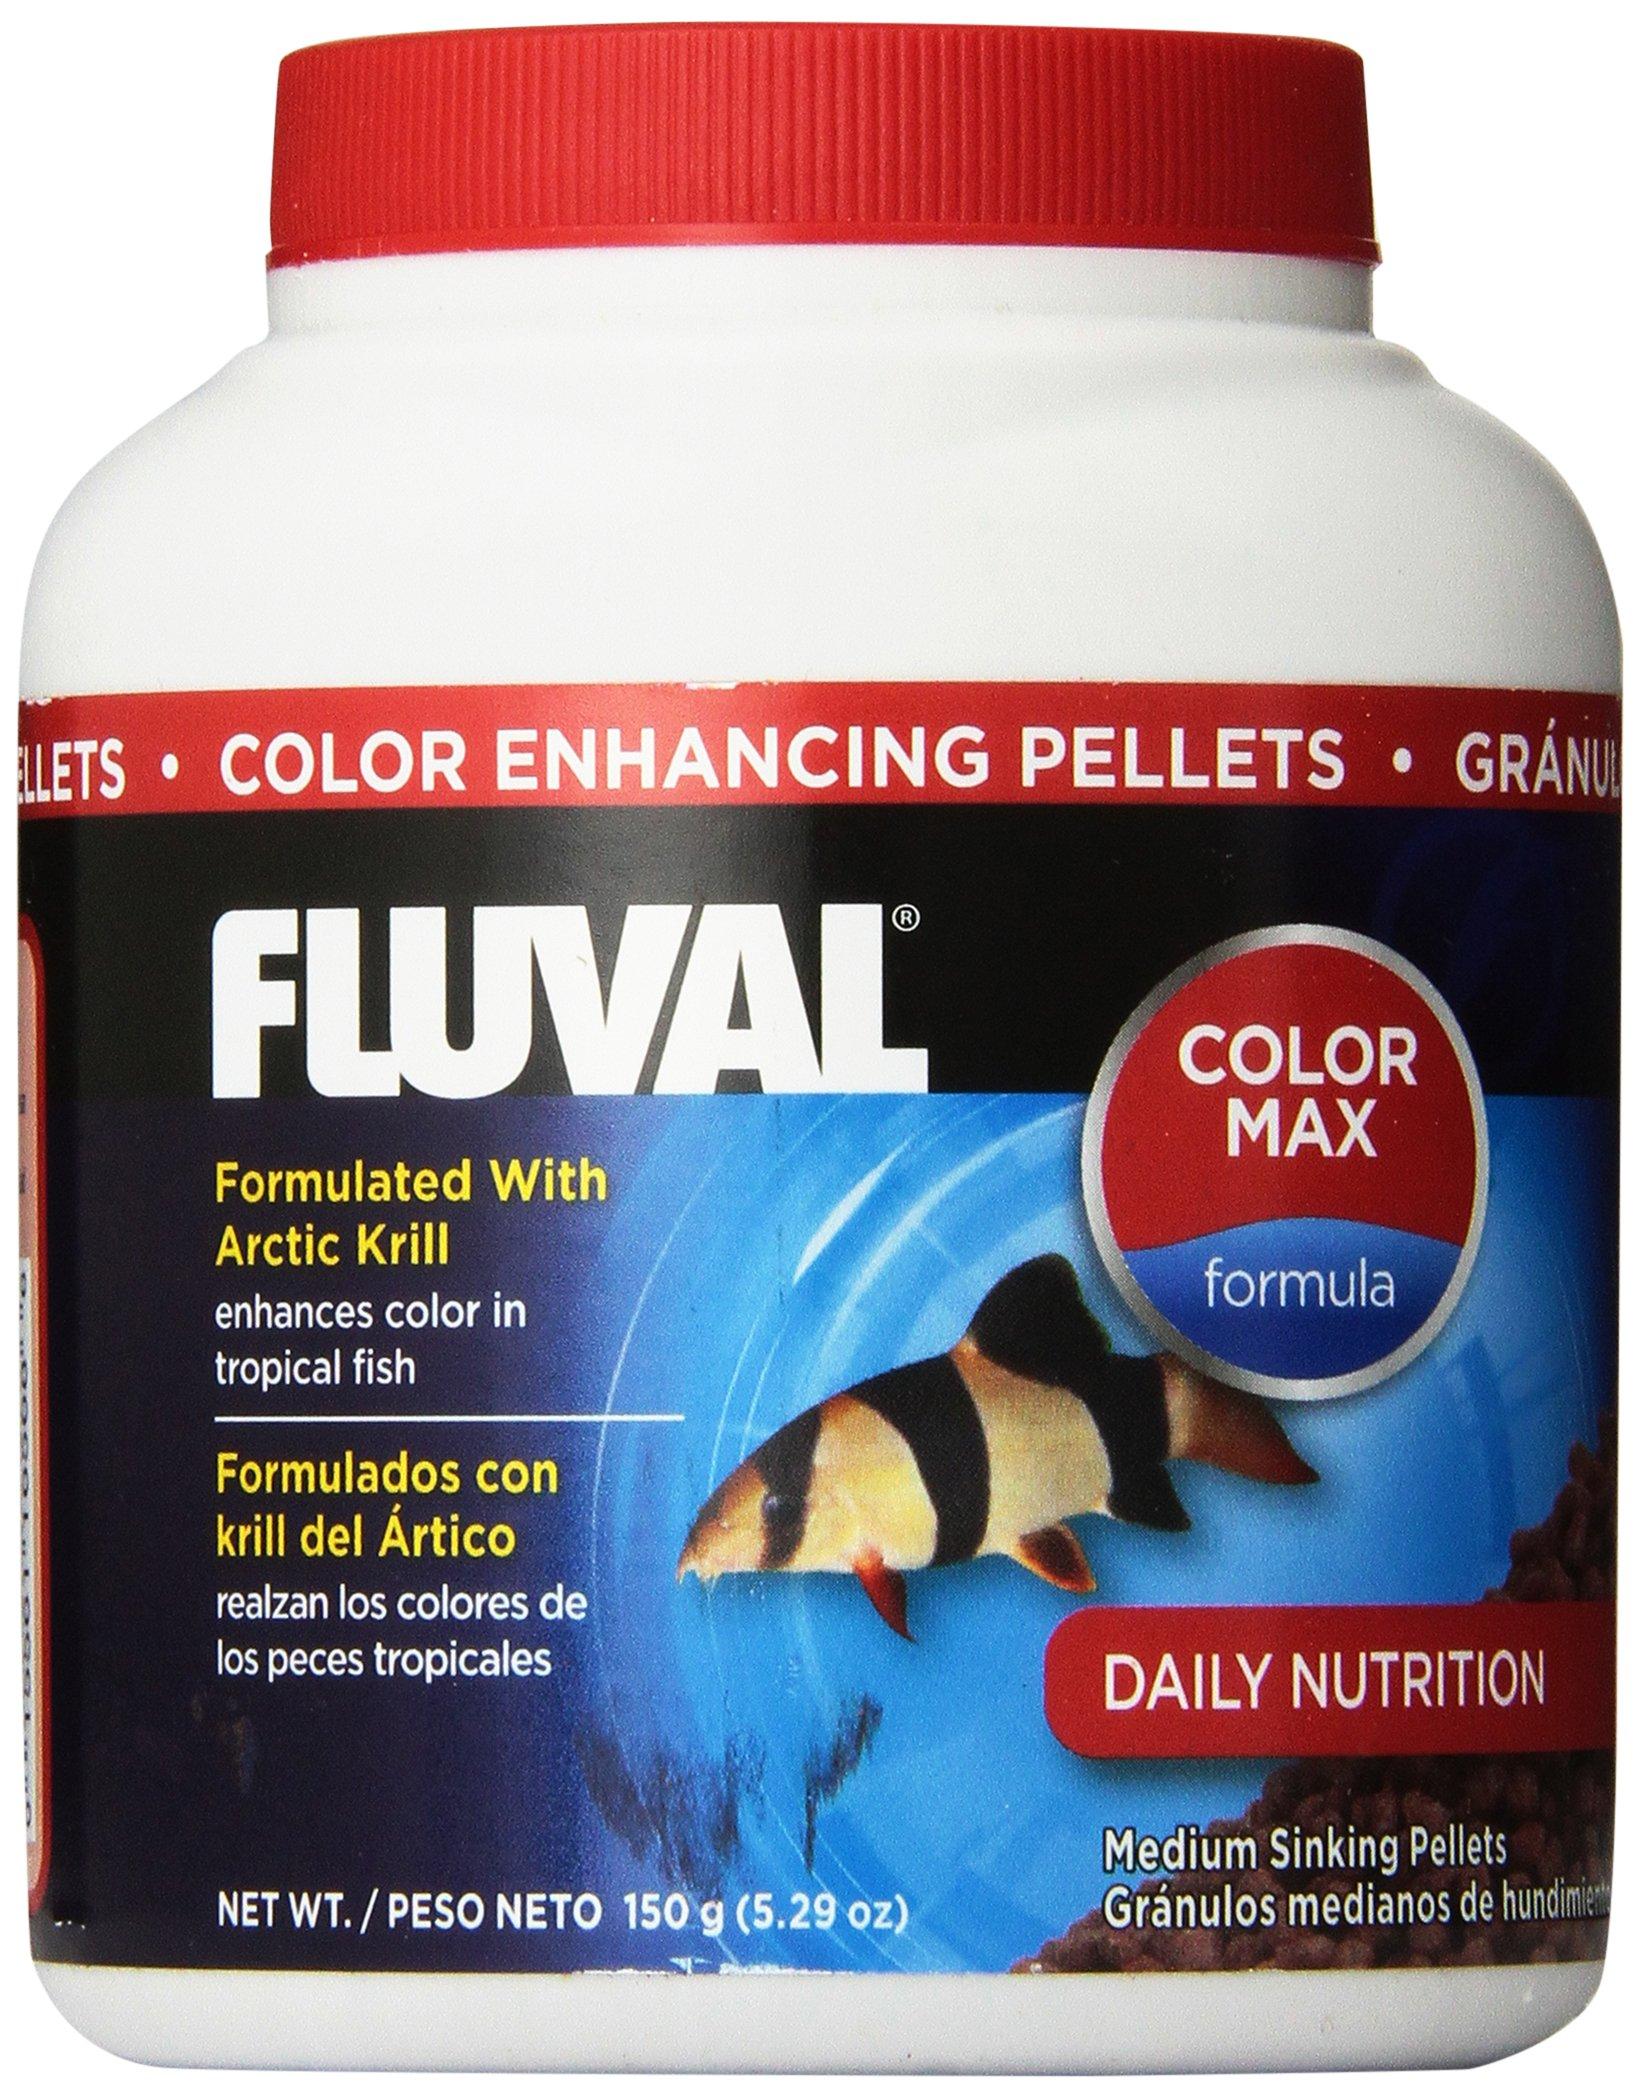 150gm Fluval Color Enhancing Pellets Fish Food, 5.29-Ounce ...